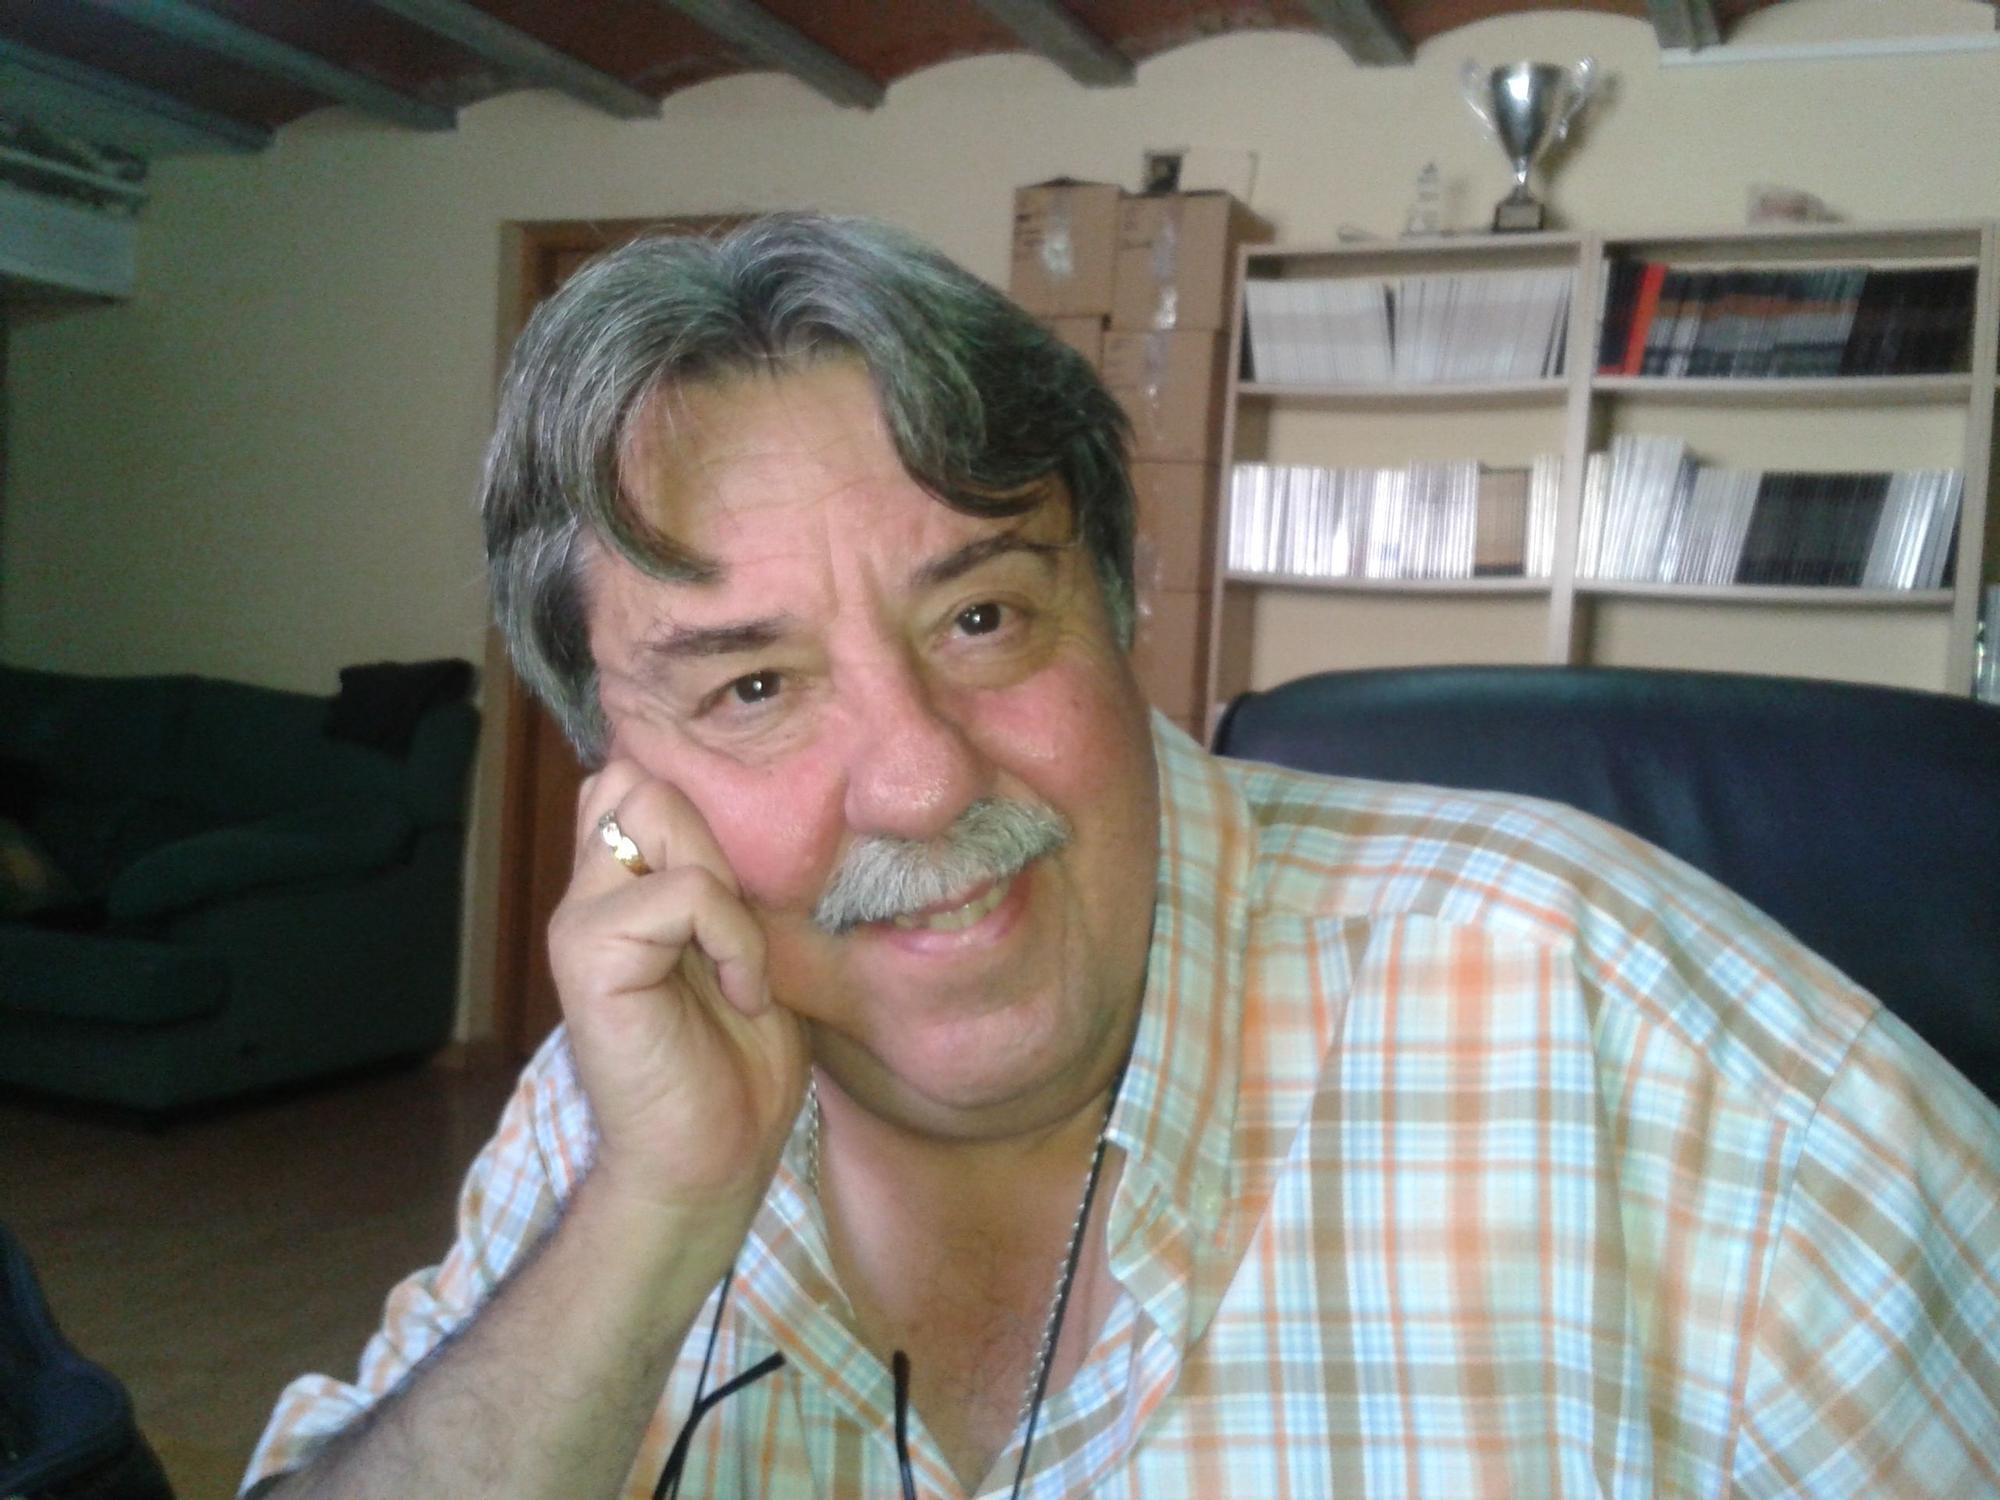 Jordi Sedó